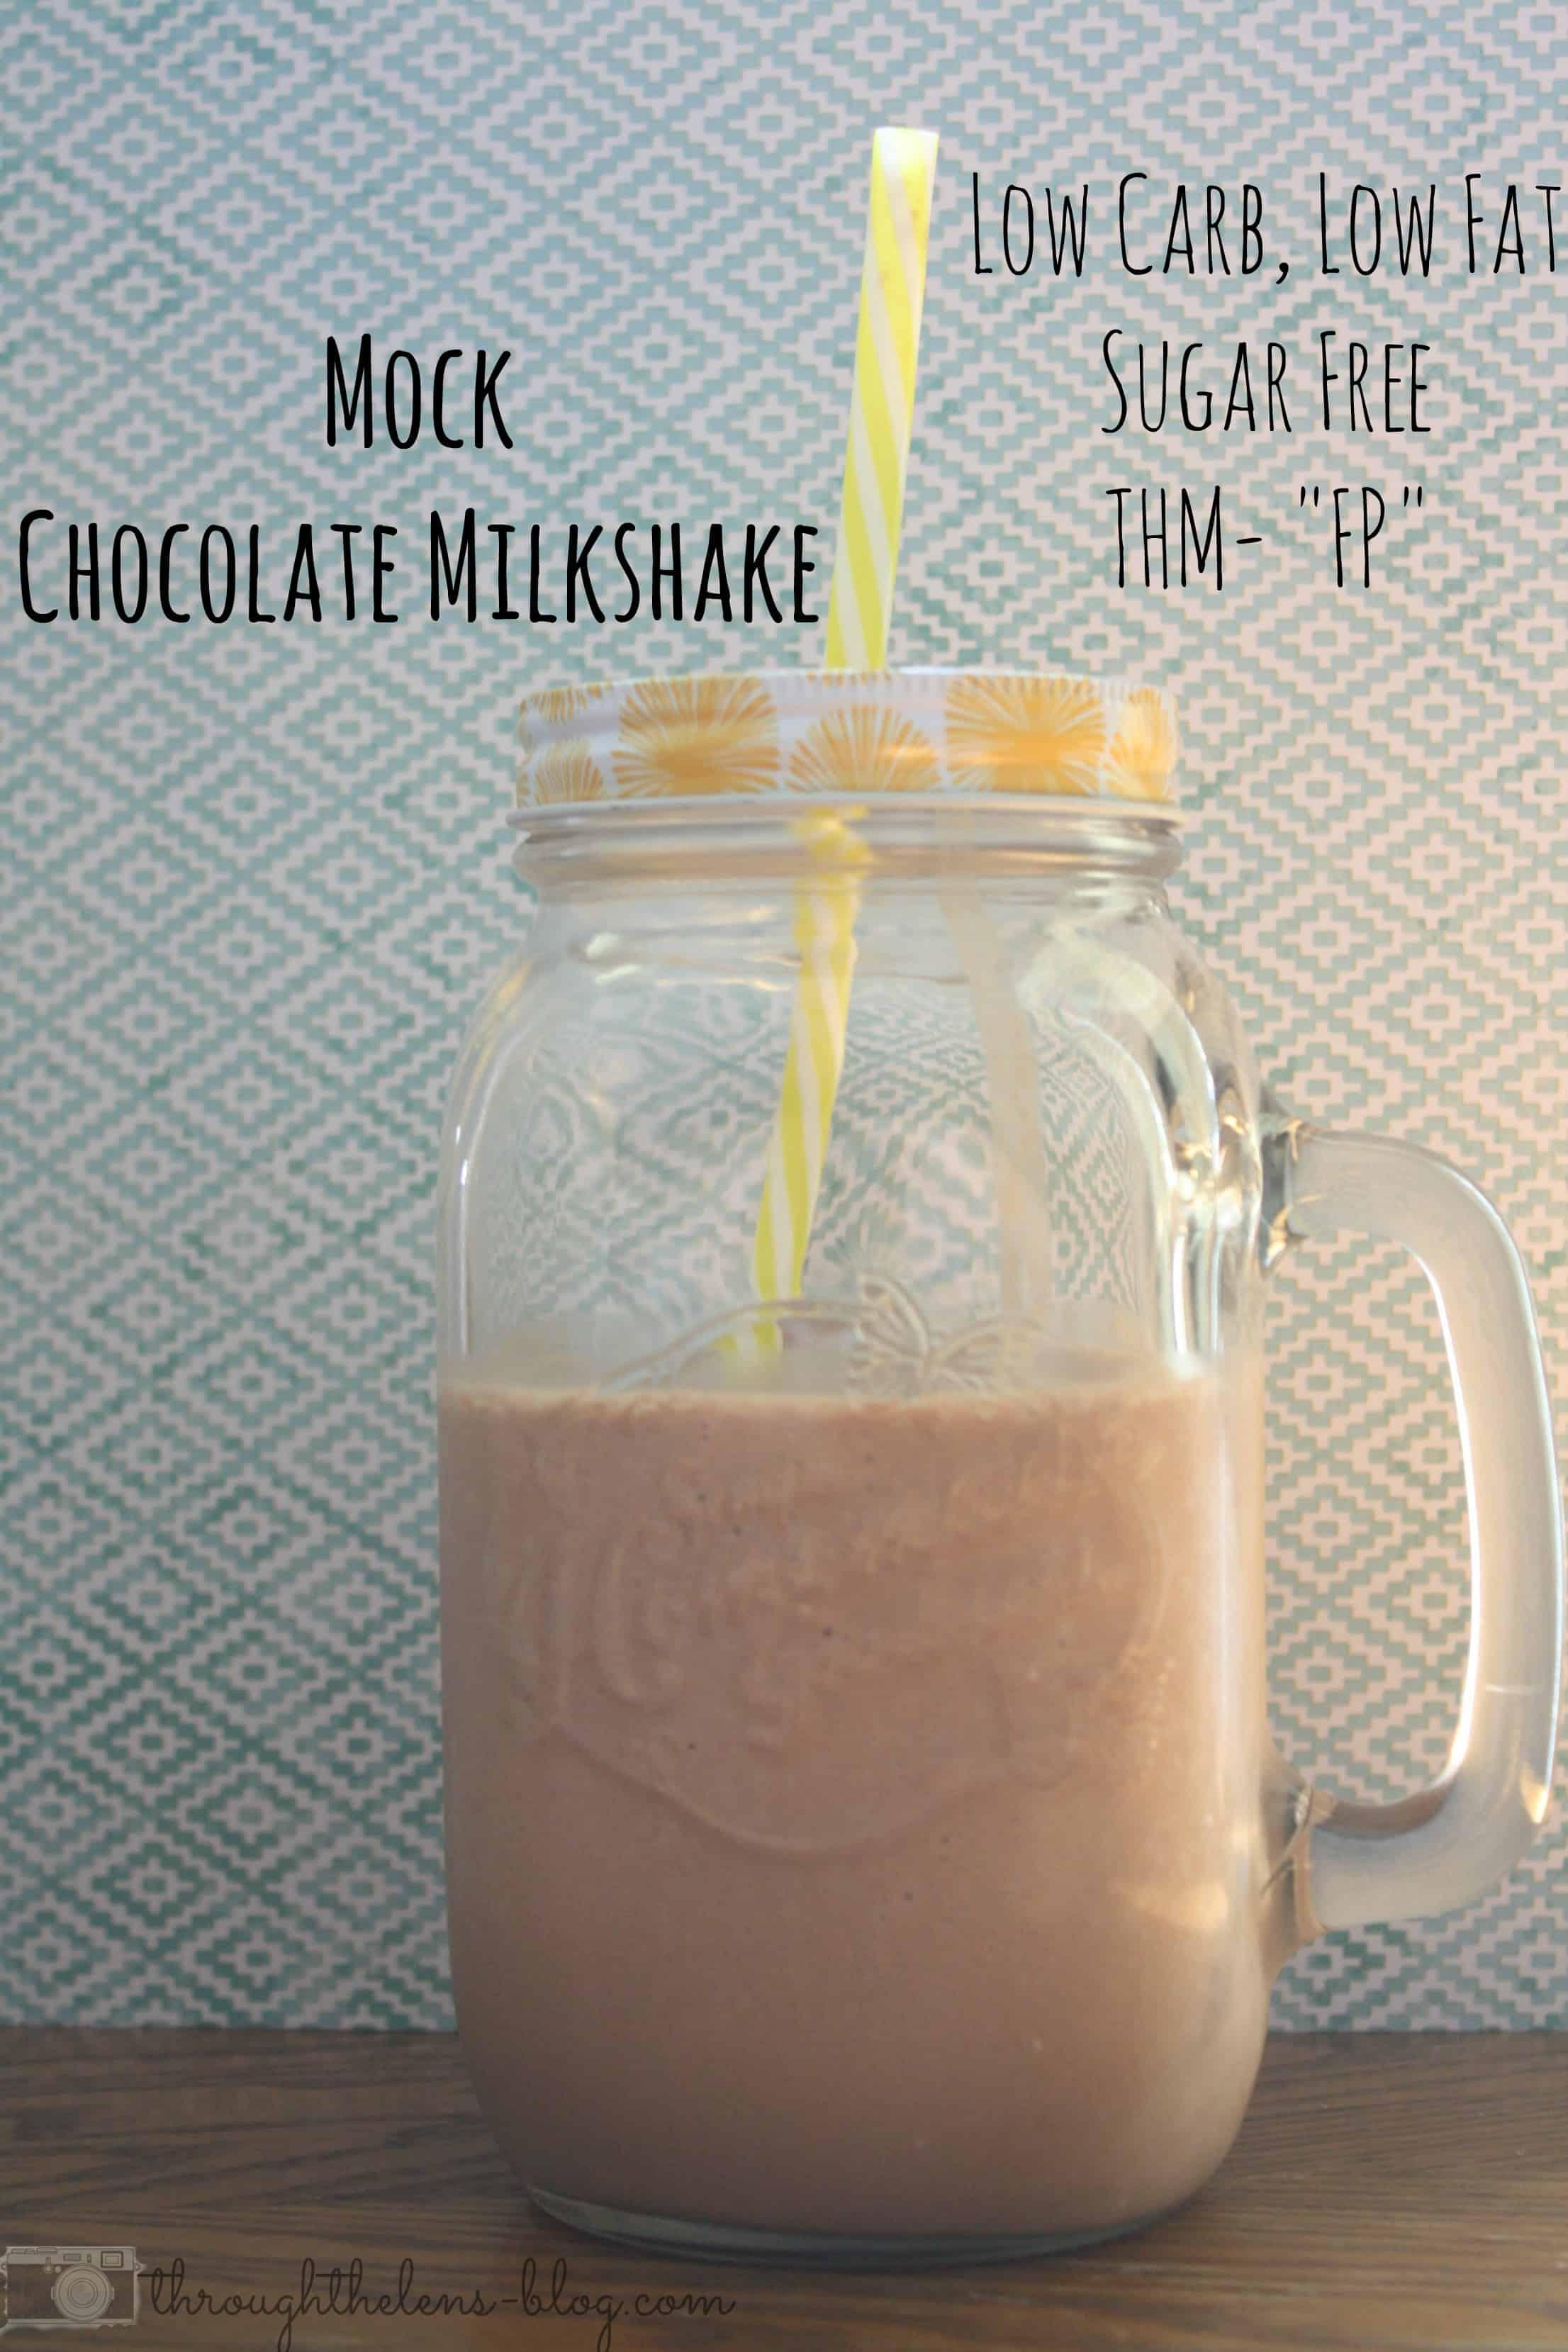 Low Carb, Sugar Free Chocolate Milkshake